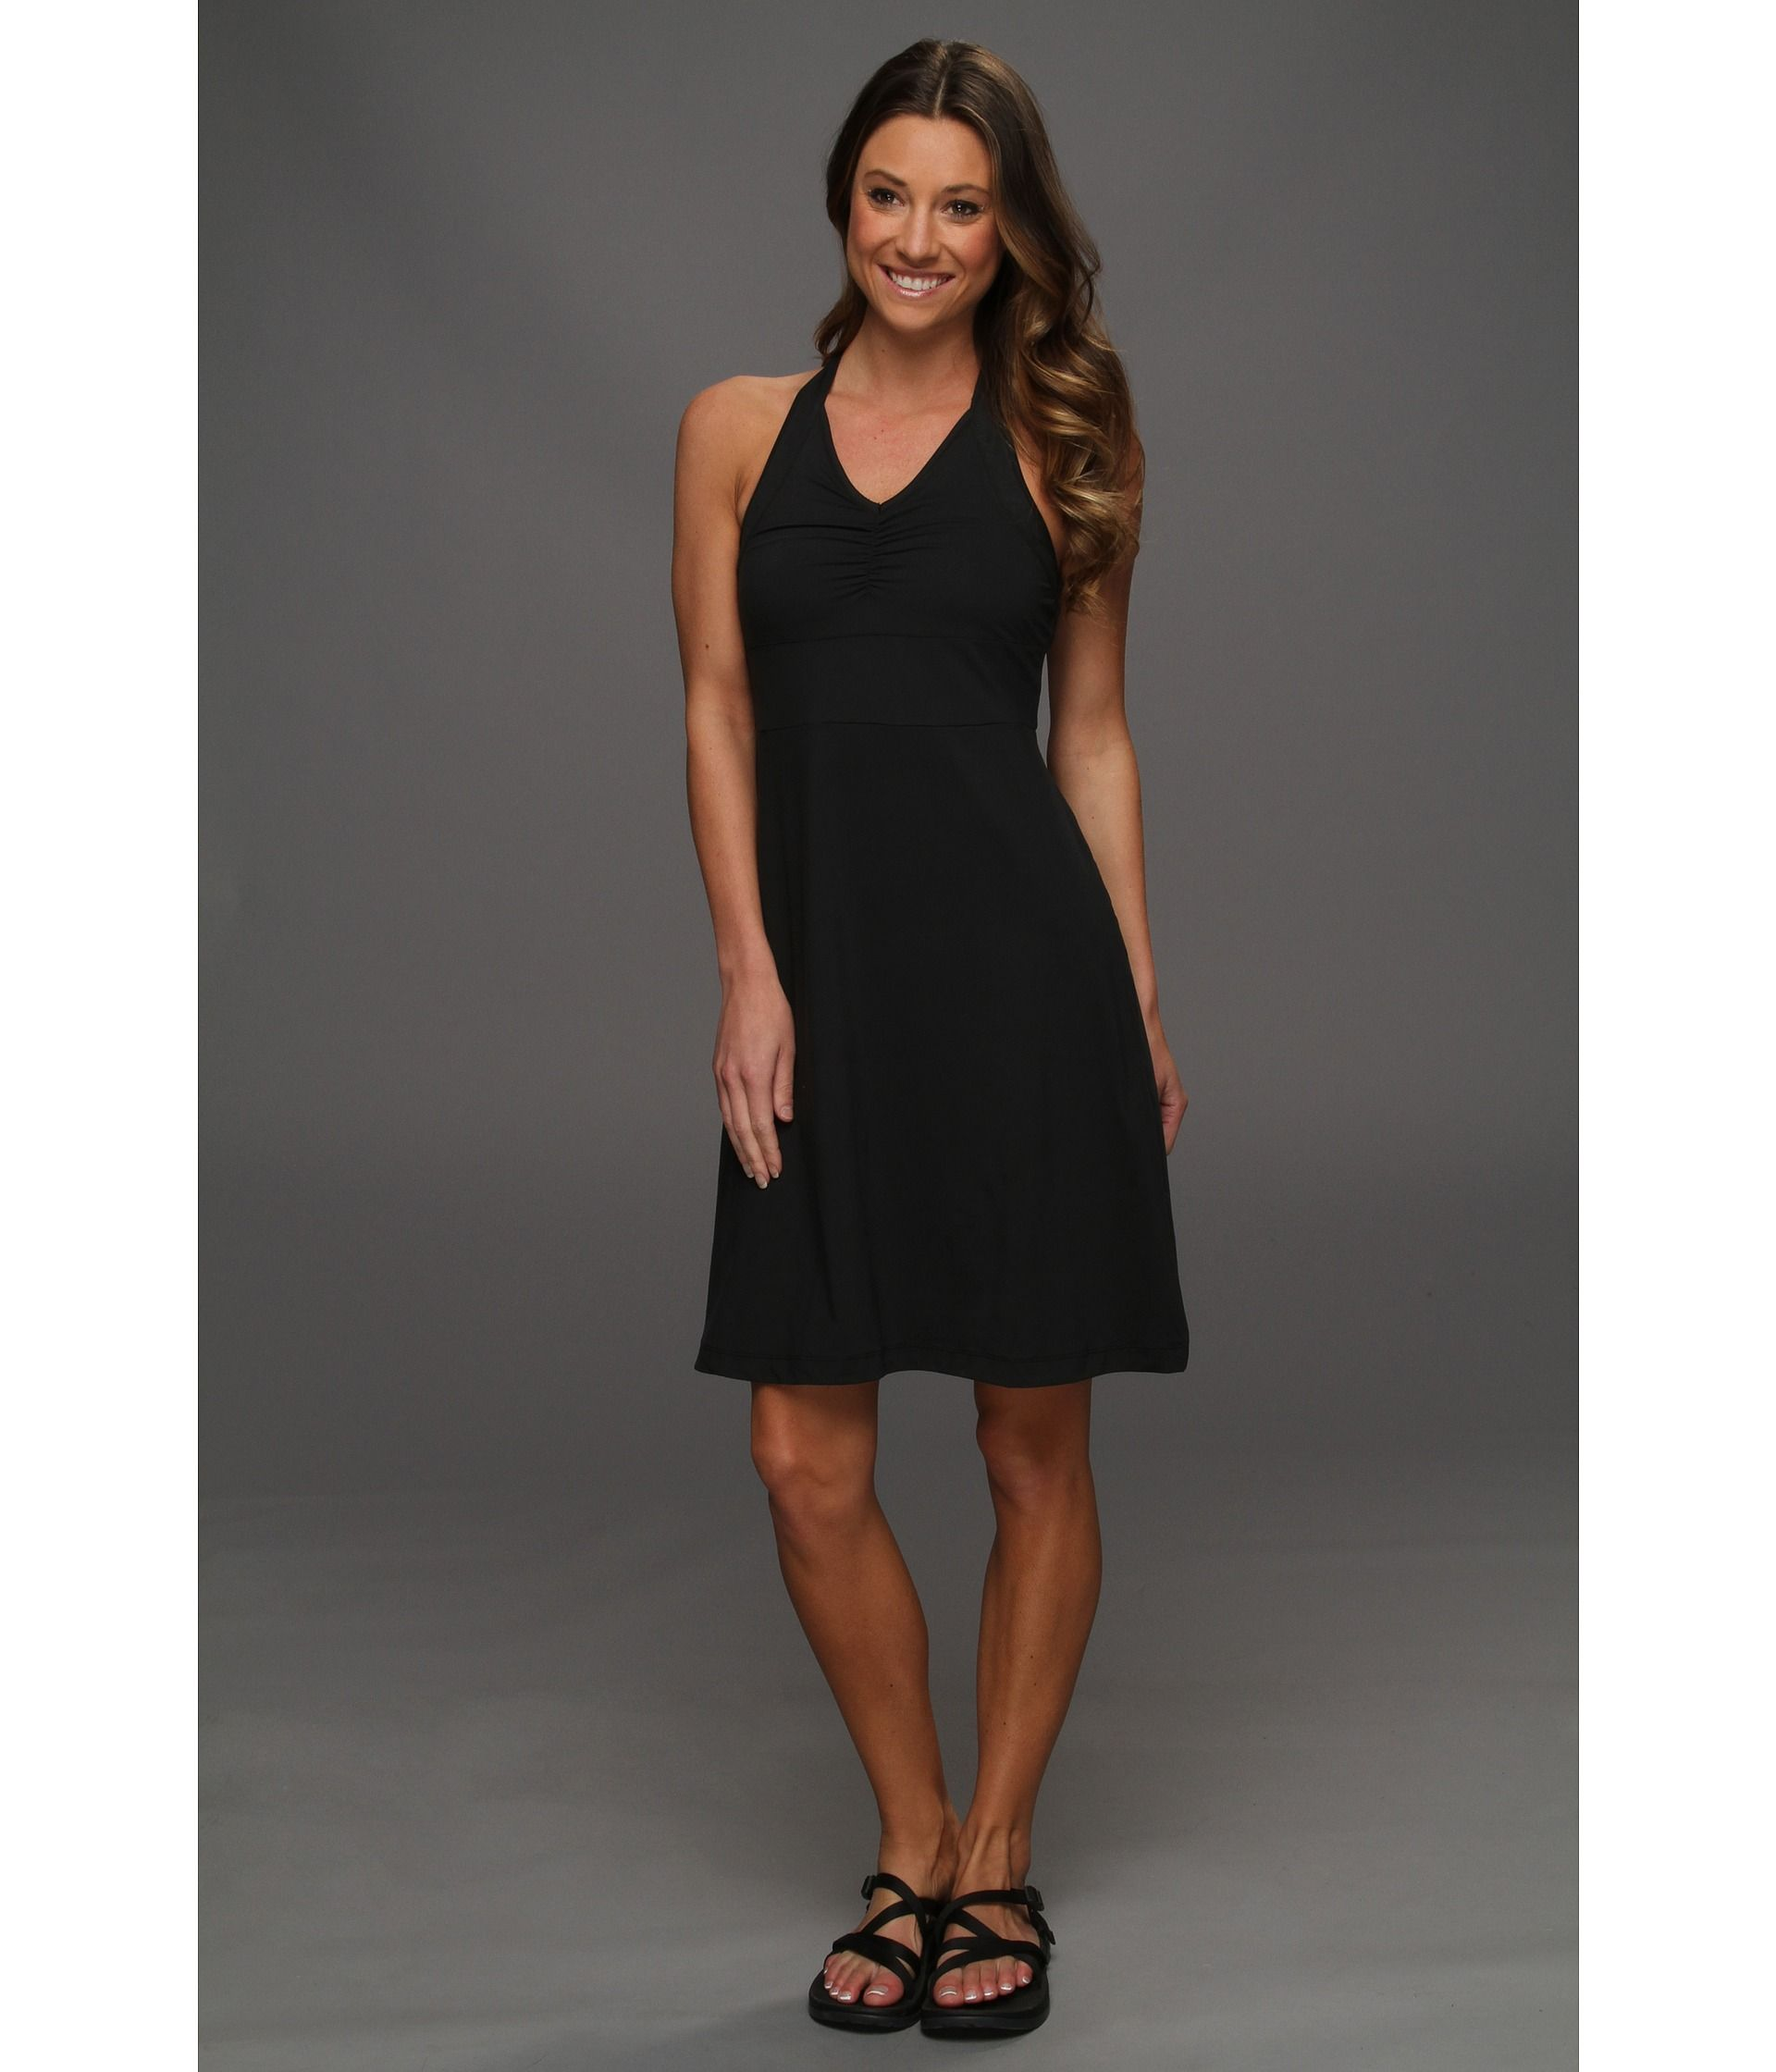 Merrell Ellsworth Dress Black - 6pm.com